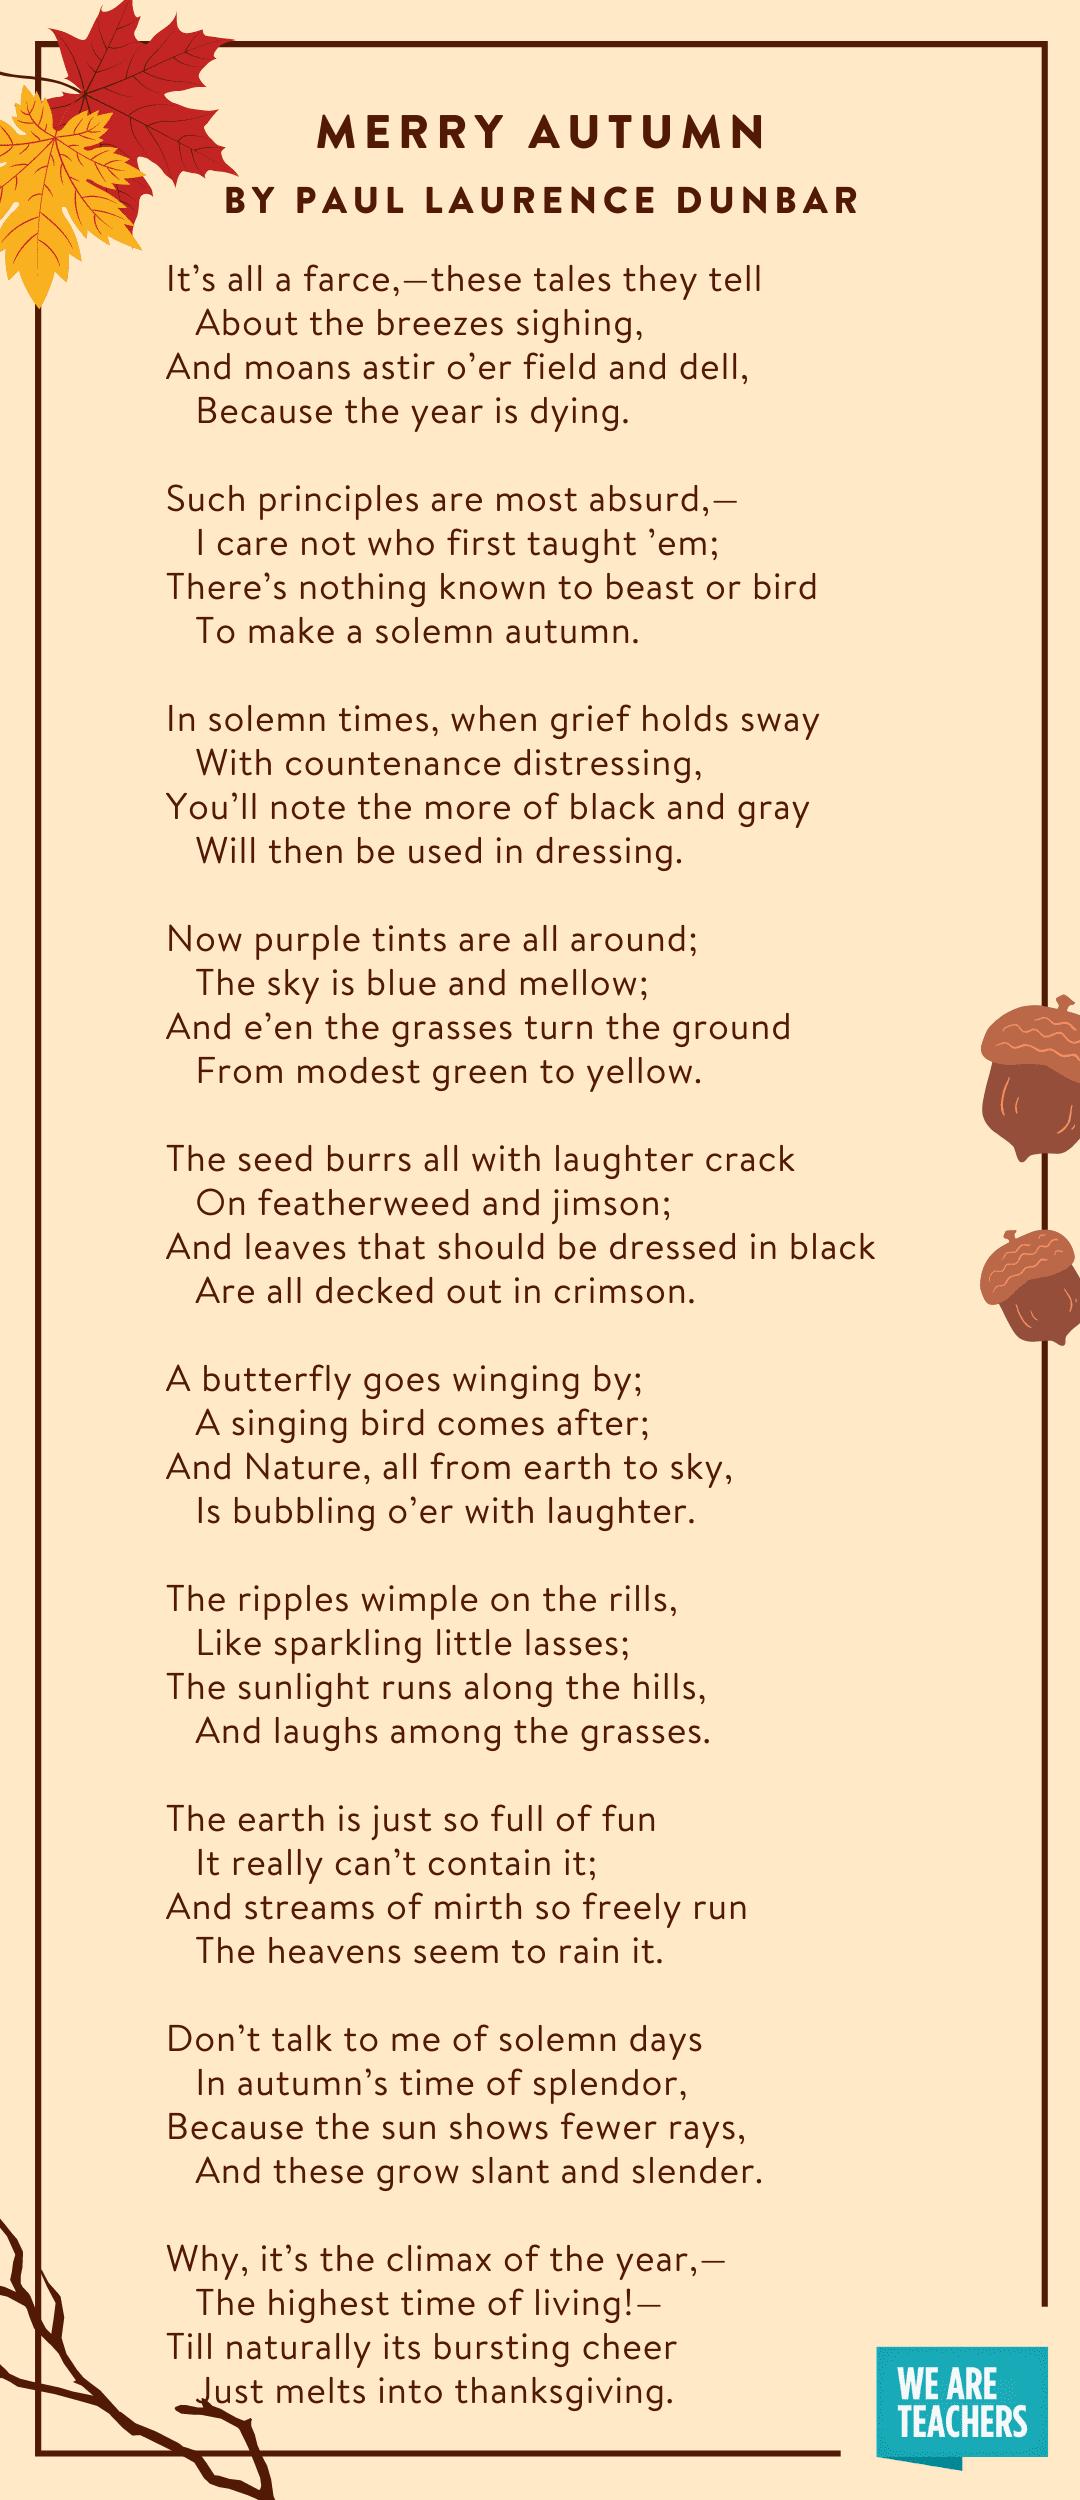 Merry Autumn fall poems